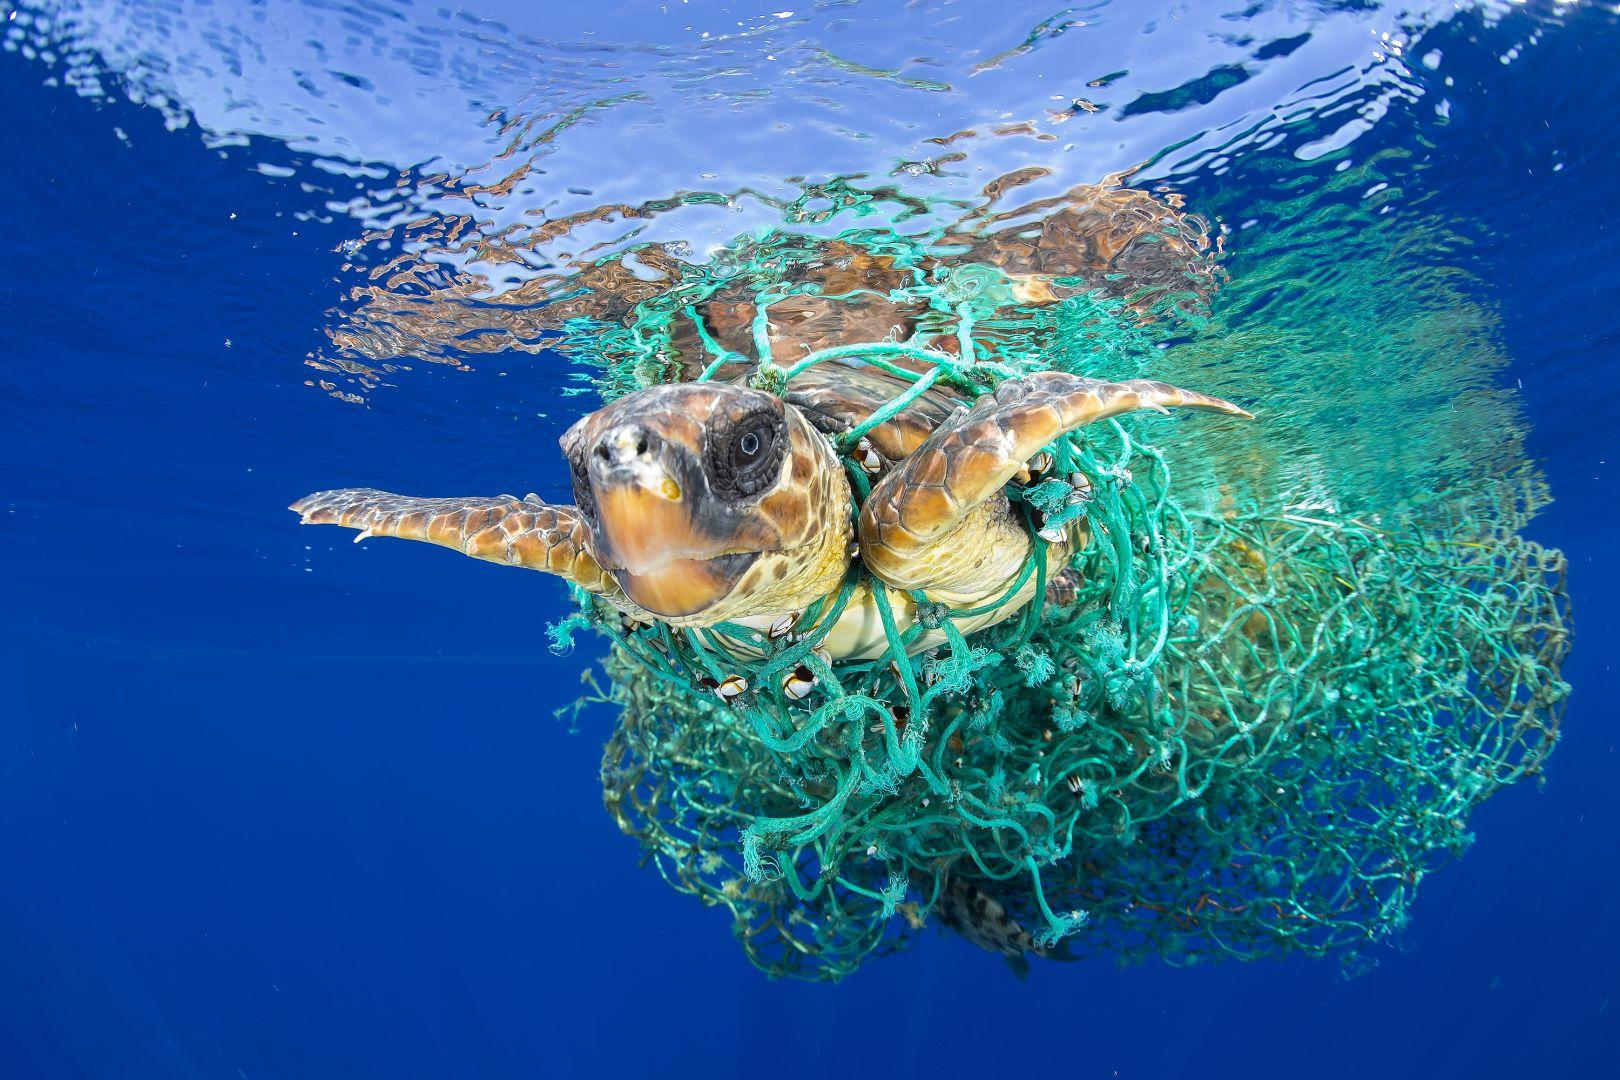 Морская черепаха в ловушке, © Фрэнсис Перес, Испания, Фотоконкурс World Press Photo